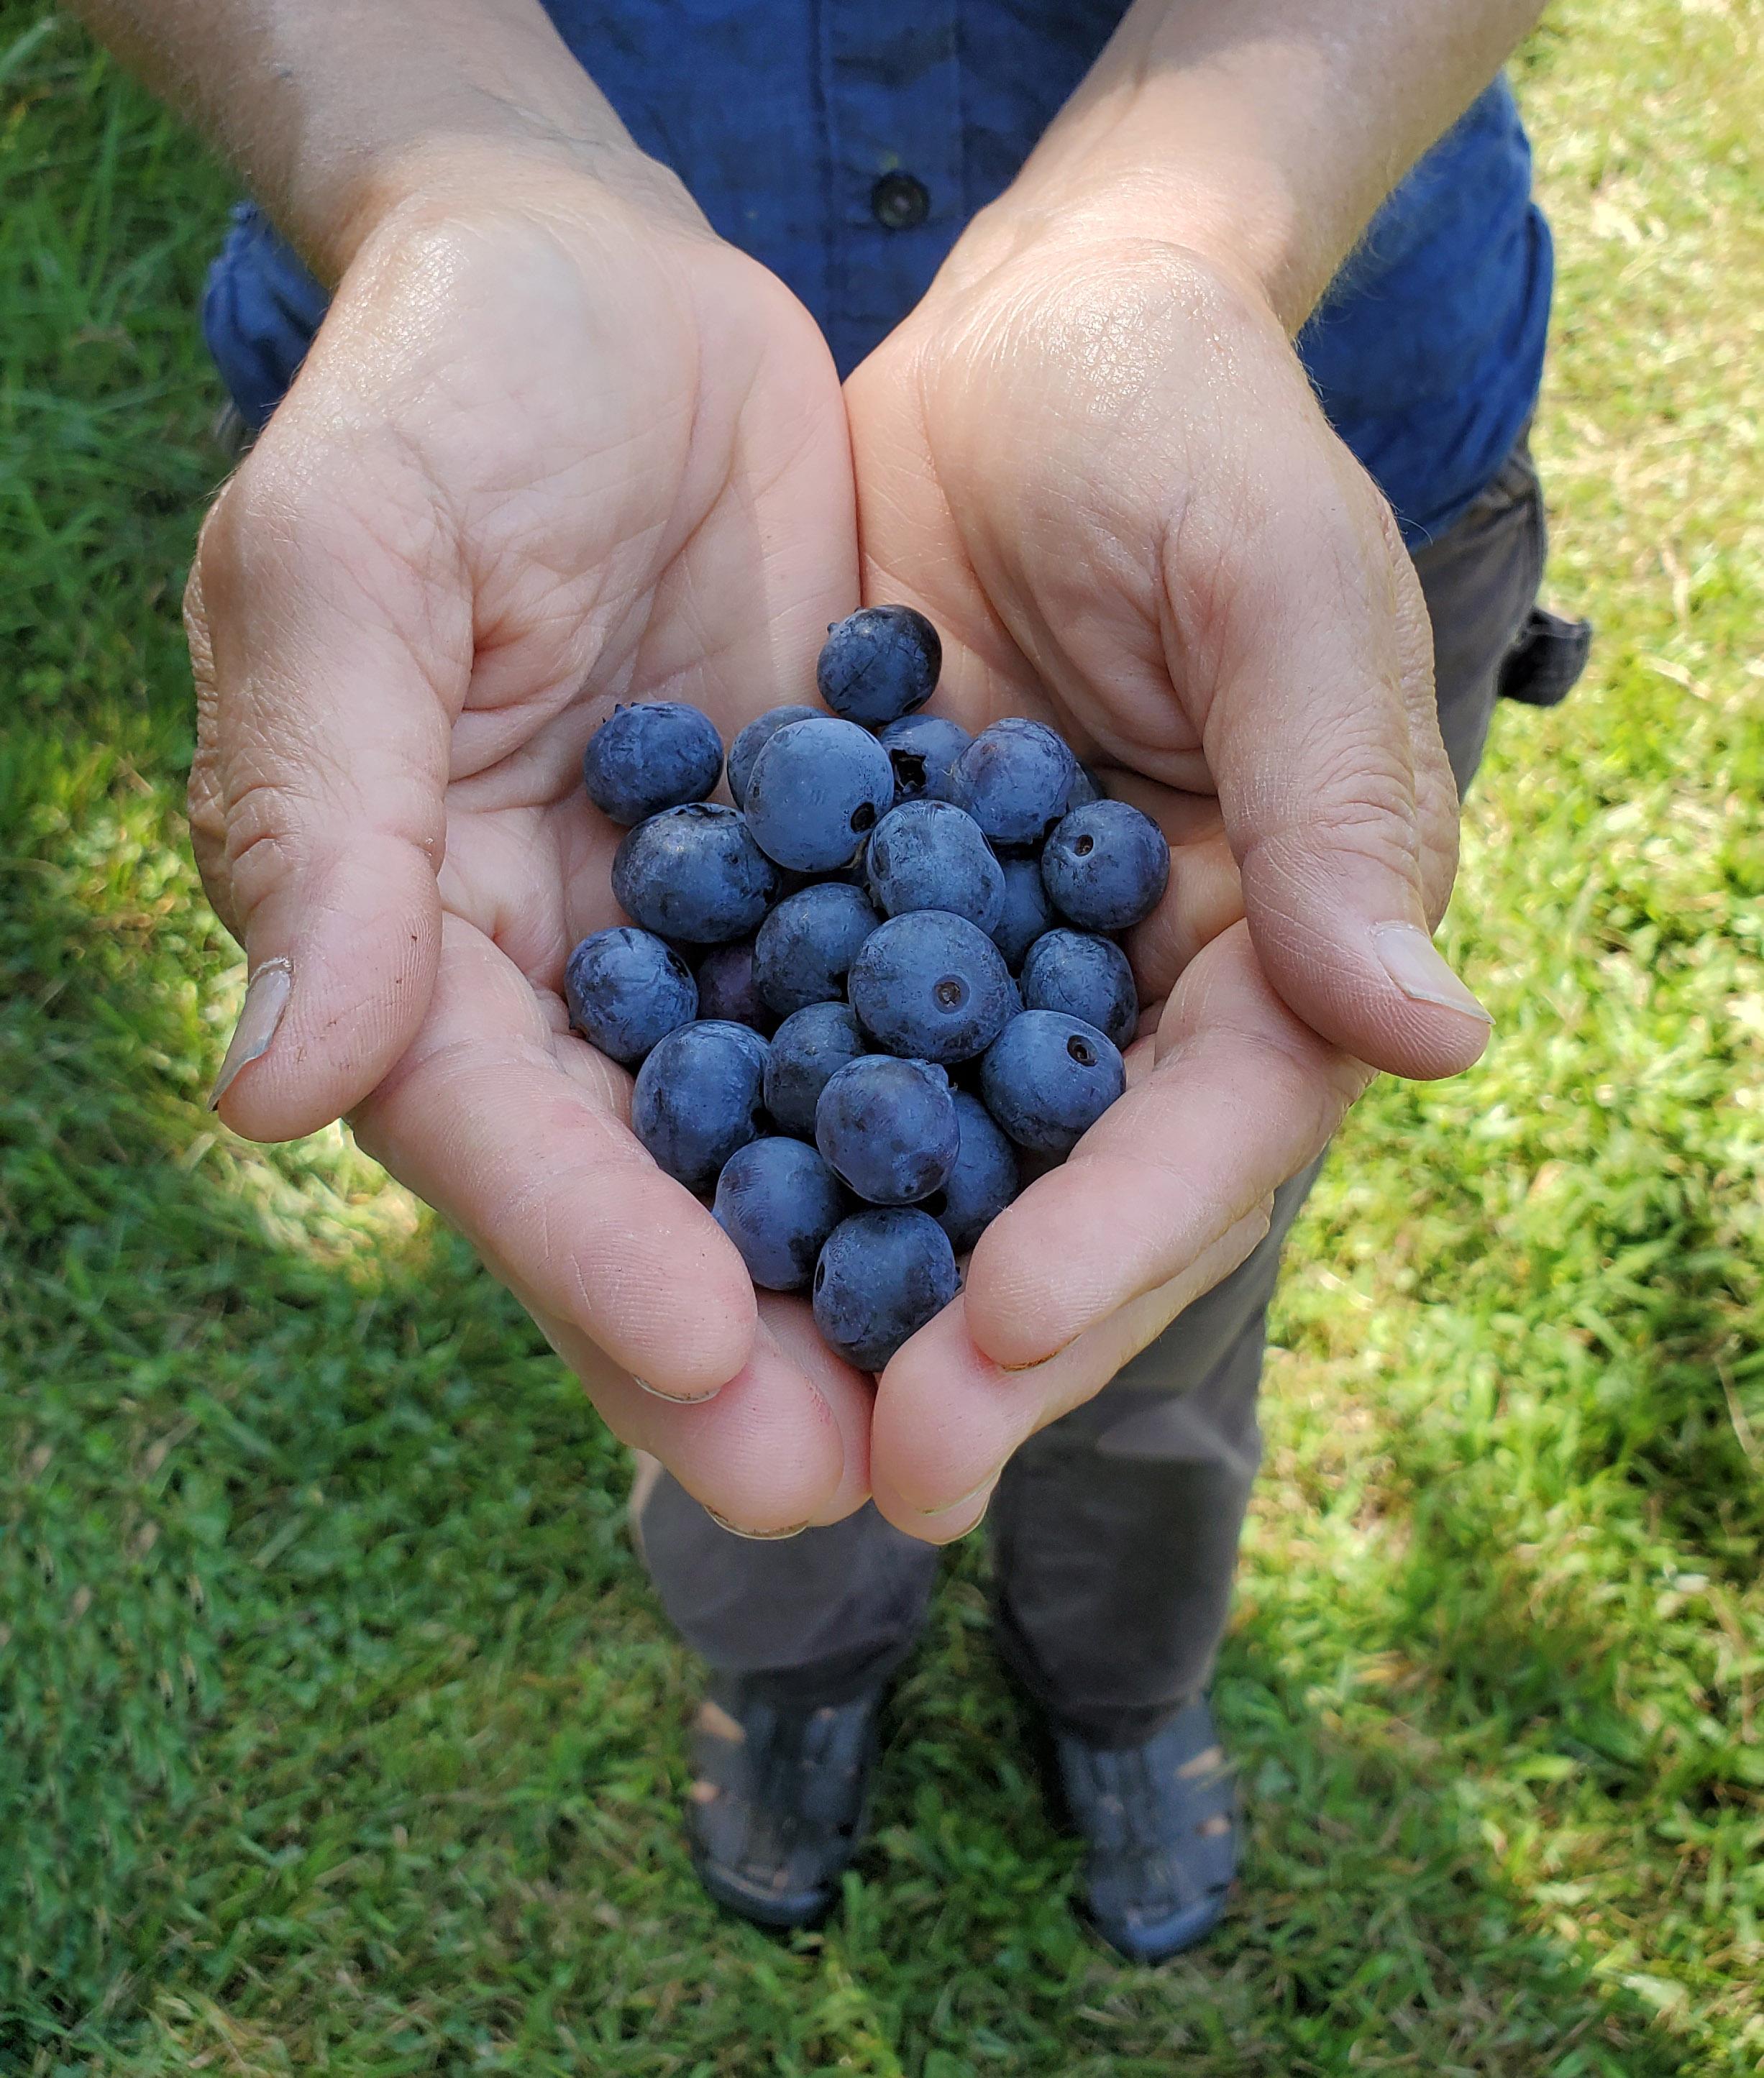 Blueberry Offering Photo: Nadine Mazzola